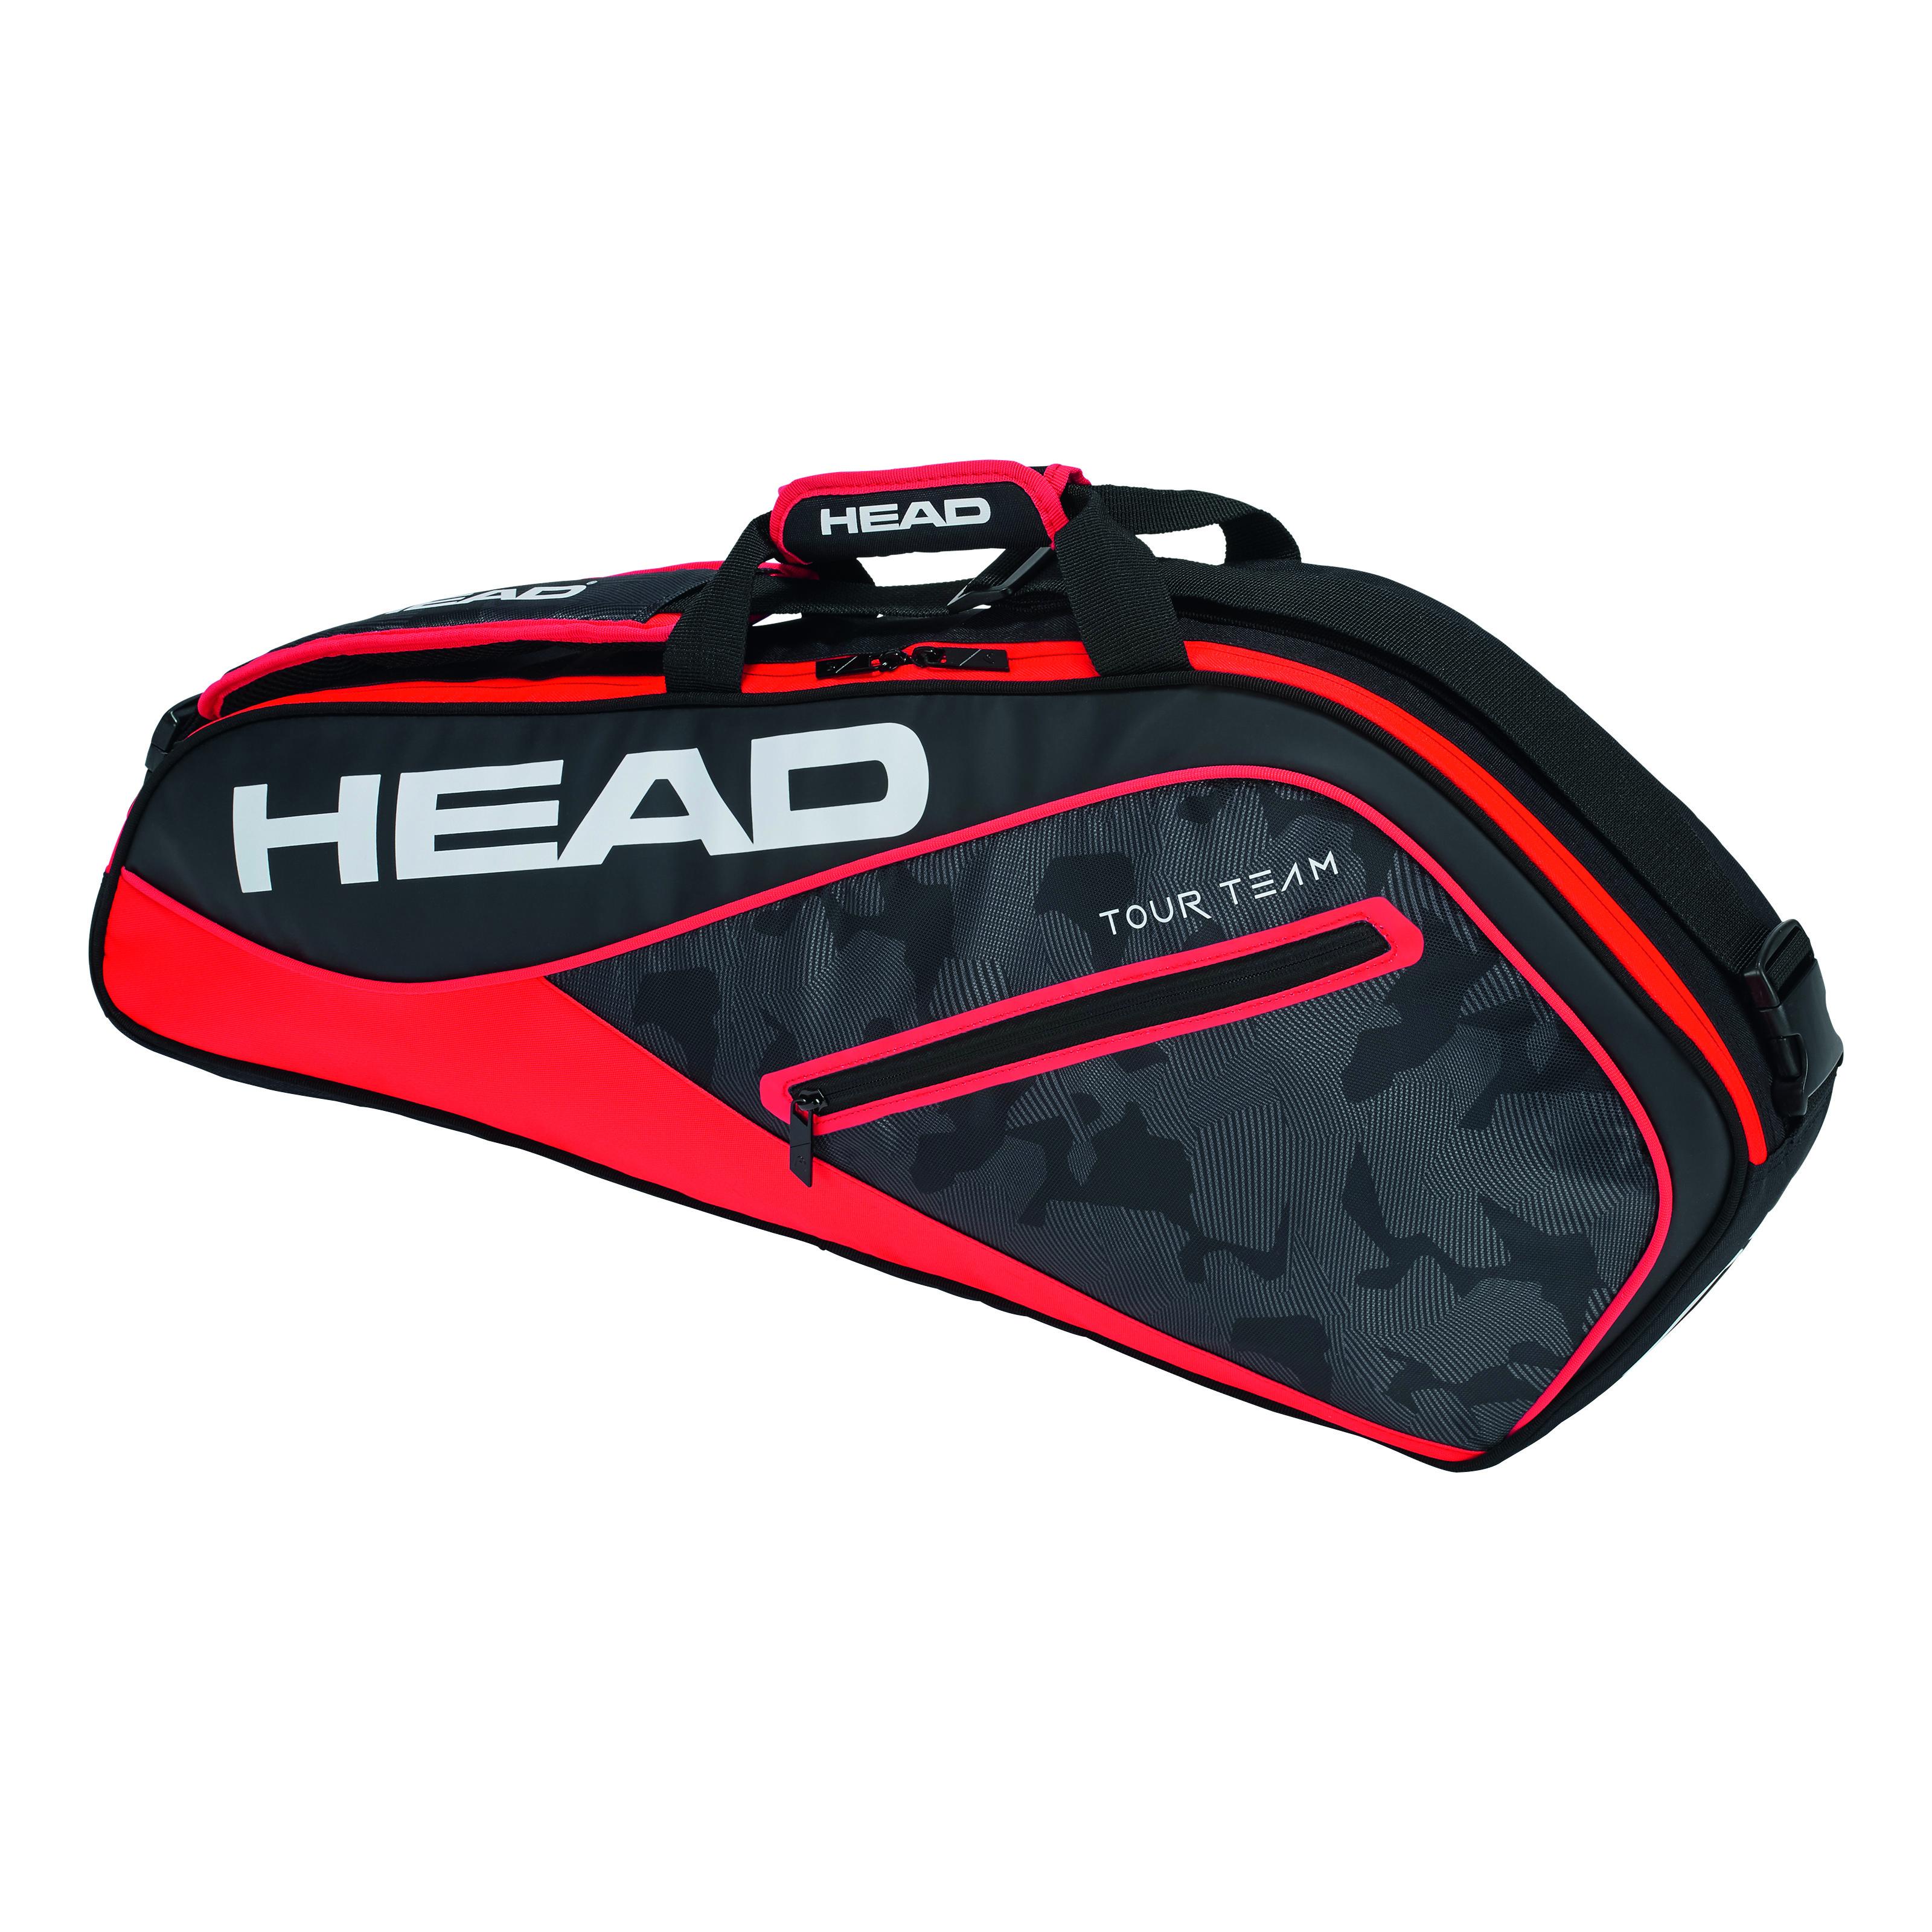 HEAD Tour team 3R Pro Black/Red 2018